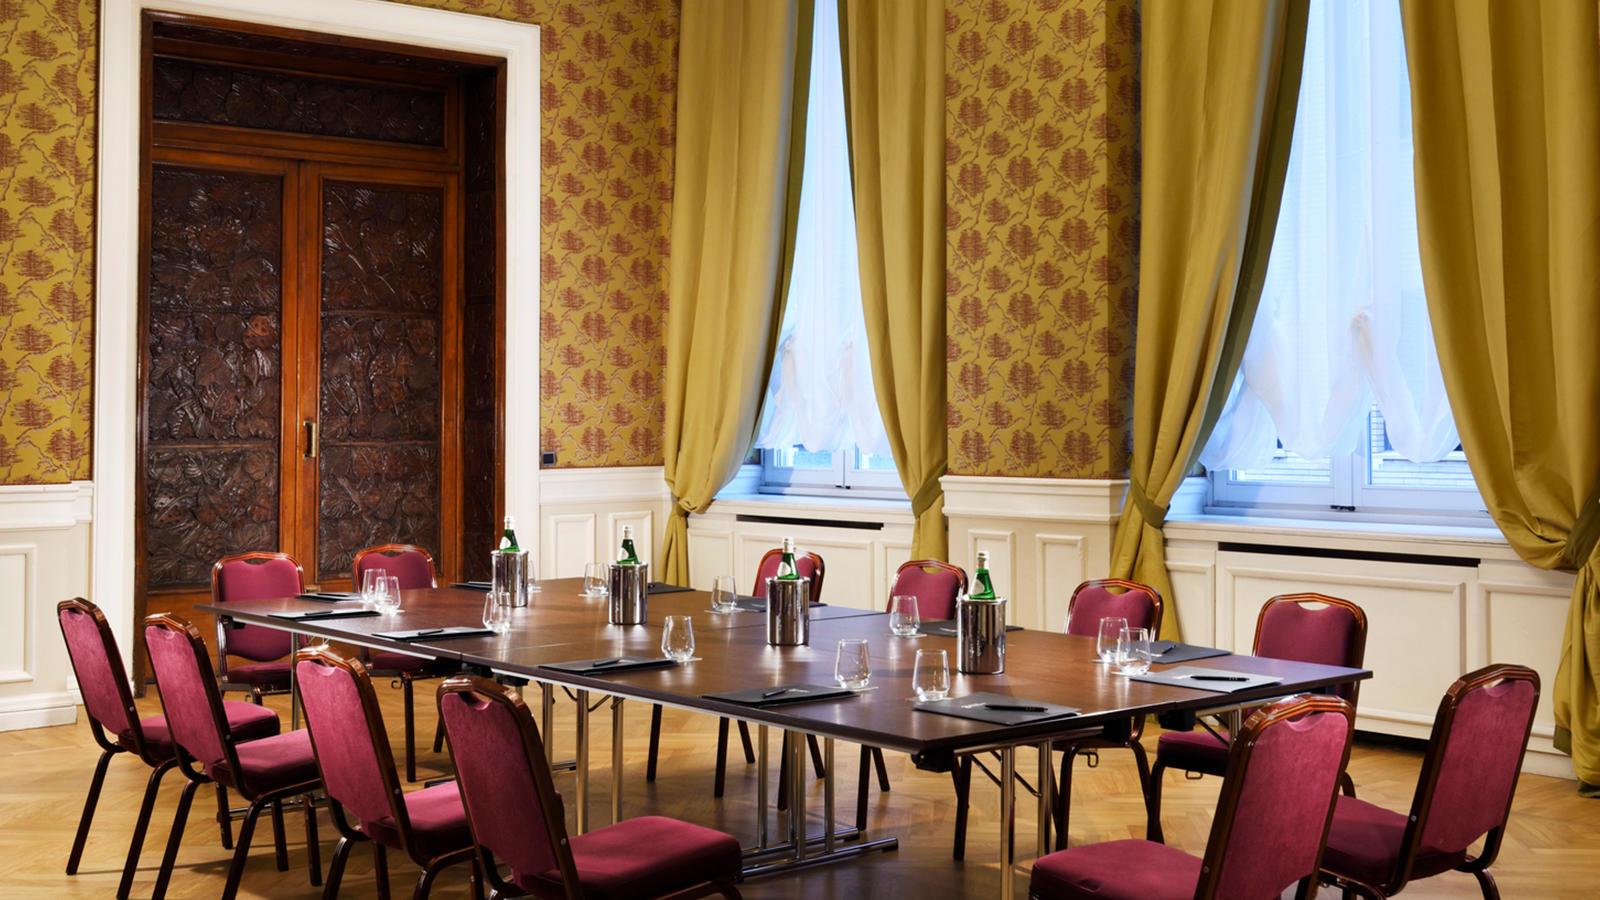 Sala Venaria Reale | Principi di Piemonte